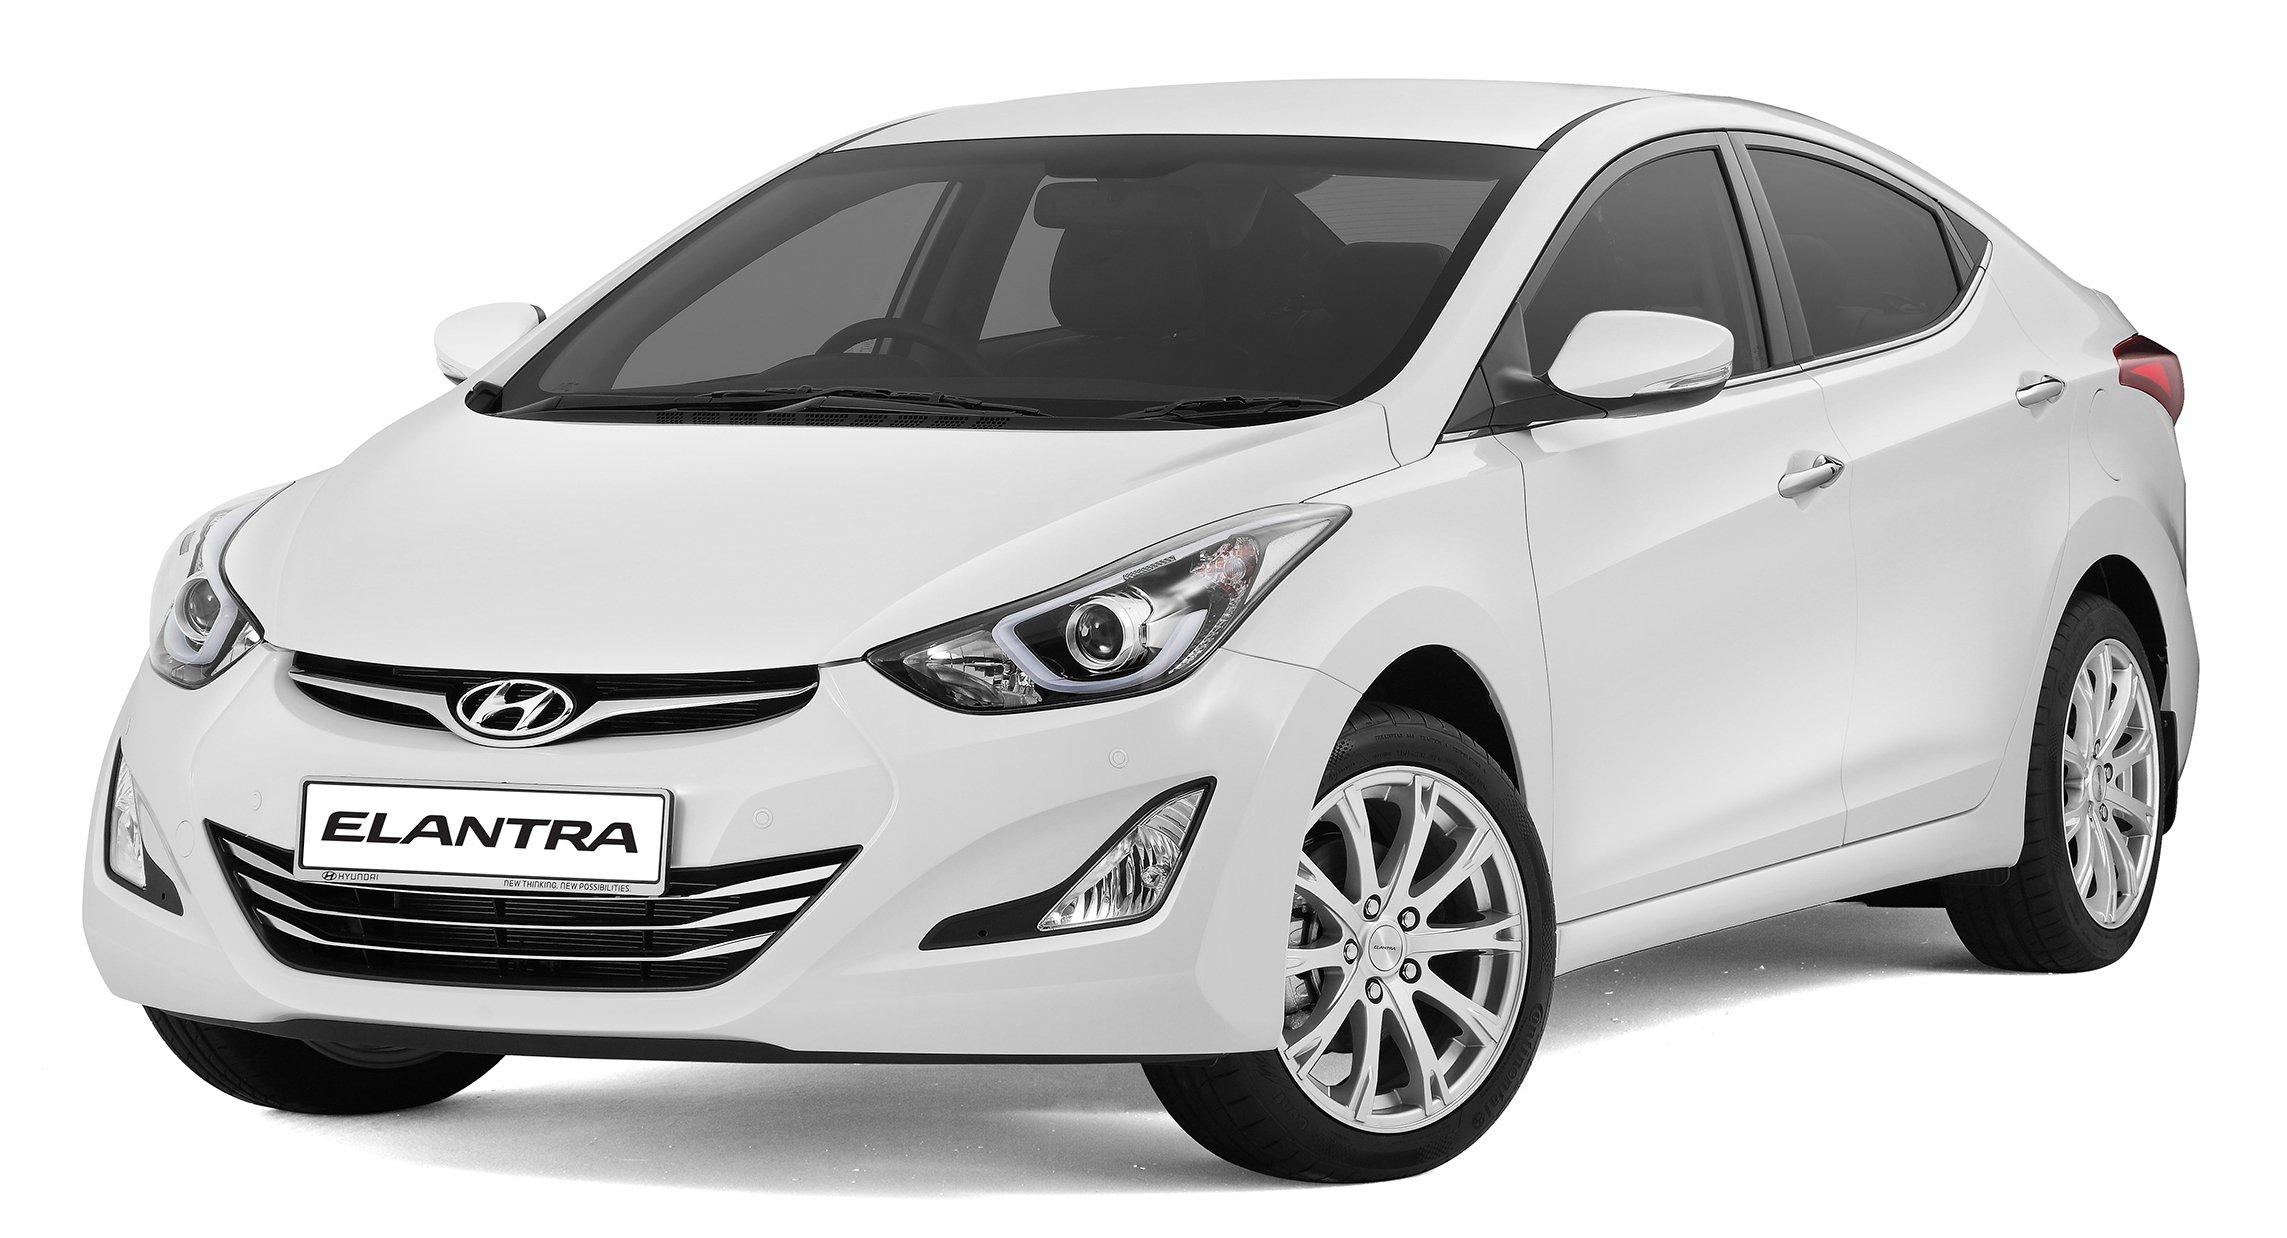 Hyundai Elantra facelift launched in Malaysia, RM86k-115k